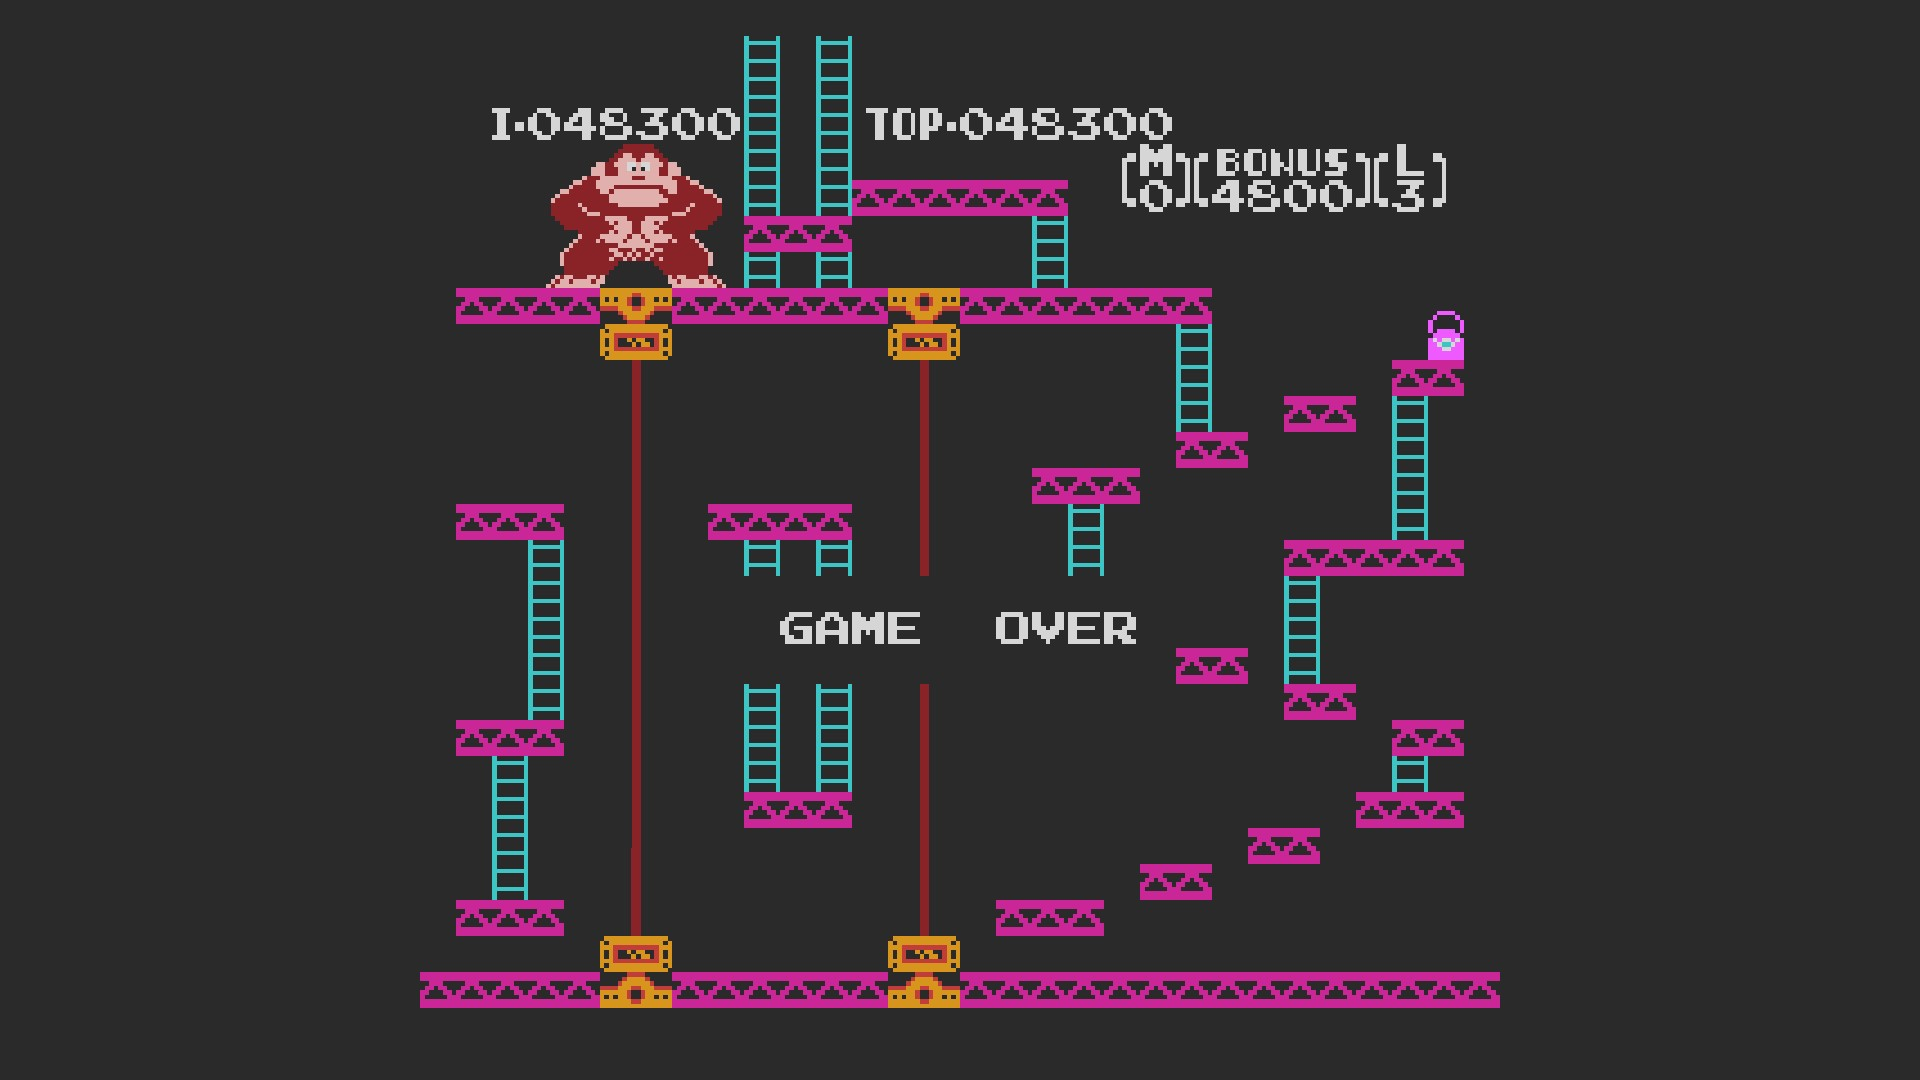 AkinNahtanoj: Donkey Kong Classics: Donkey Kong [Game A] (NES/Famicom Emulated) 48,300 points on 2020-10-06 15:14:01